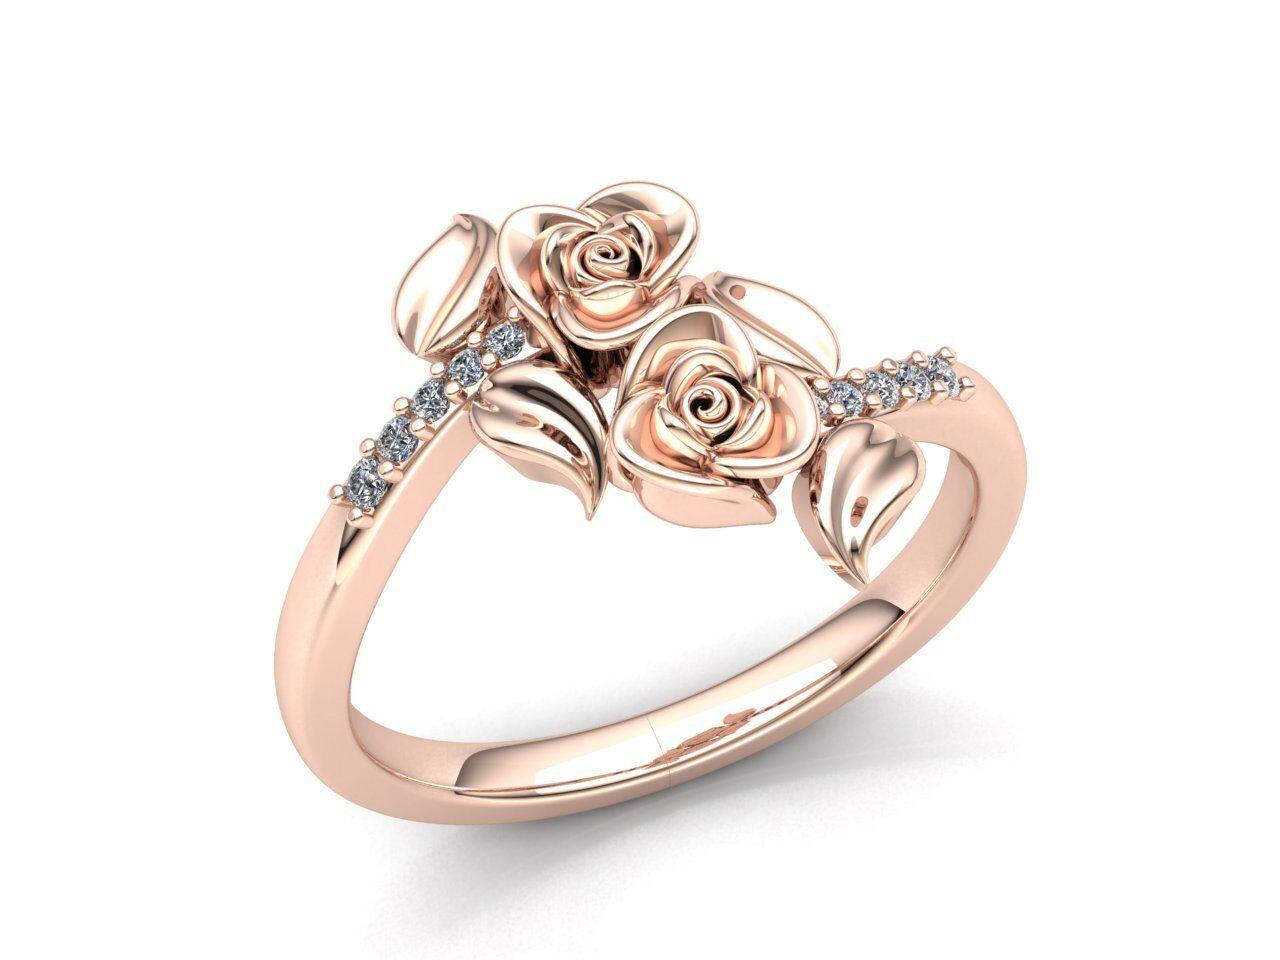 e26680e05b470 Genuine 0.5ct Round Cut Diamond Ladies Accent Flower Bridal Fancy ...